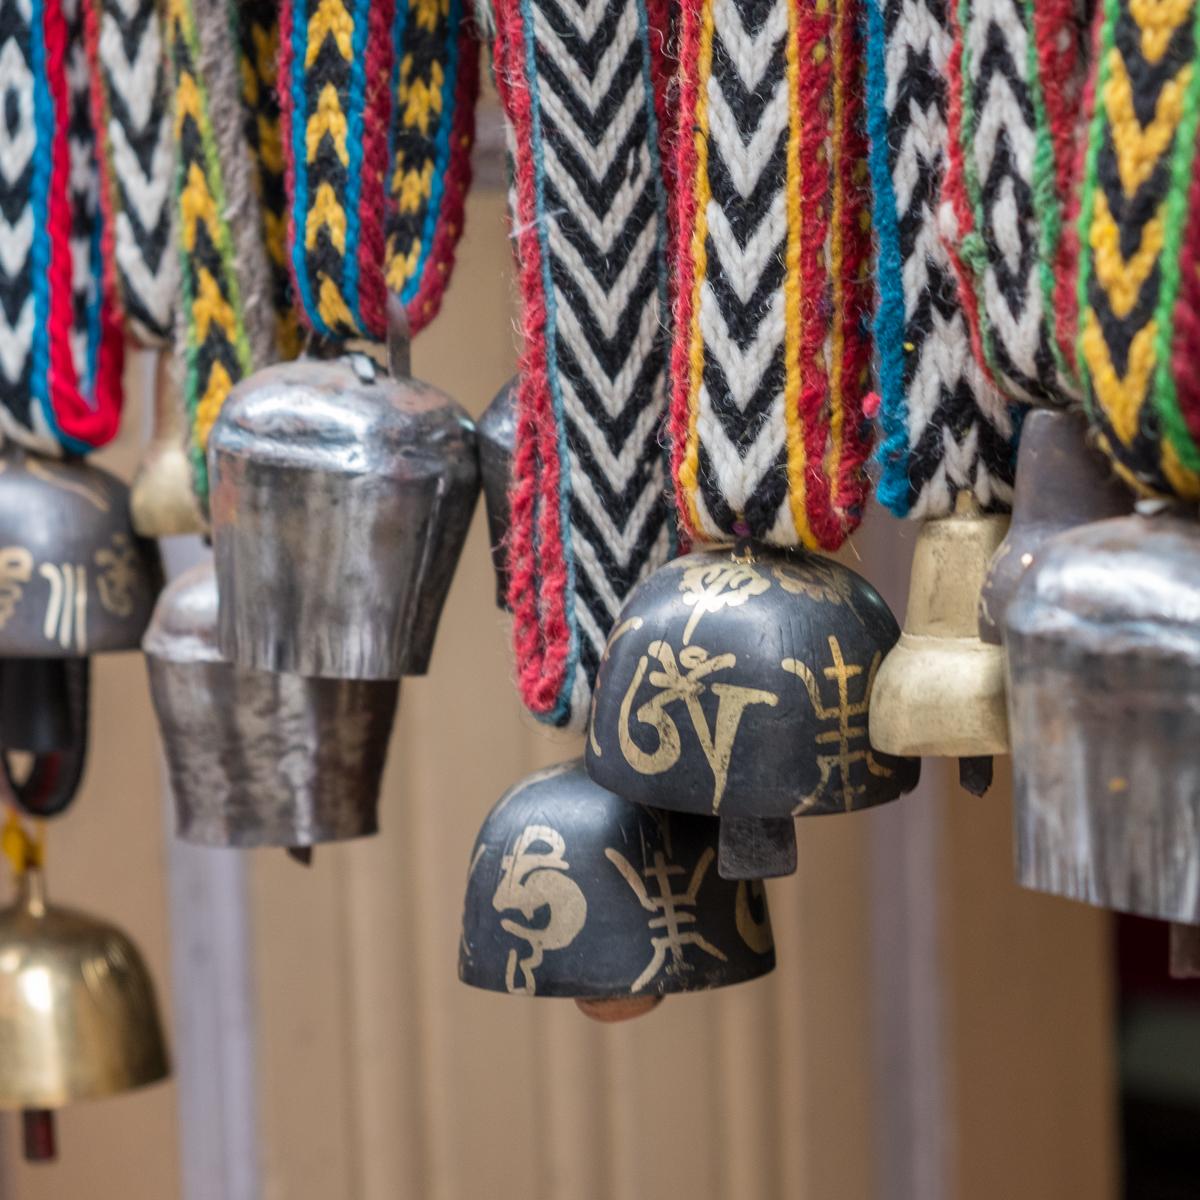 Yak bells on hand-woven straps, Namche Bazaar, Nepal.